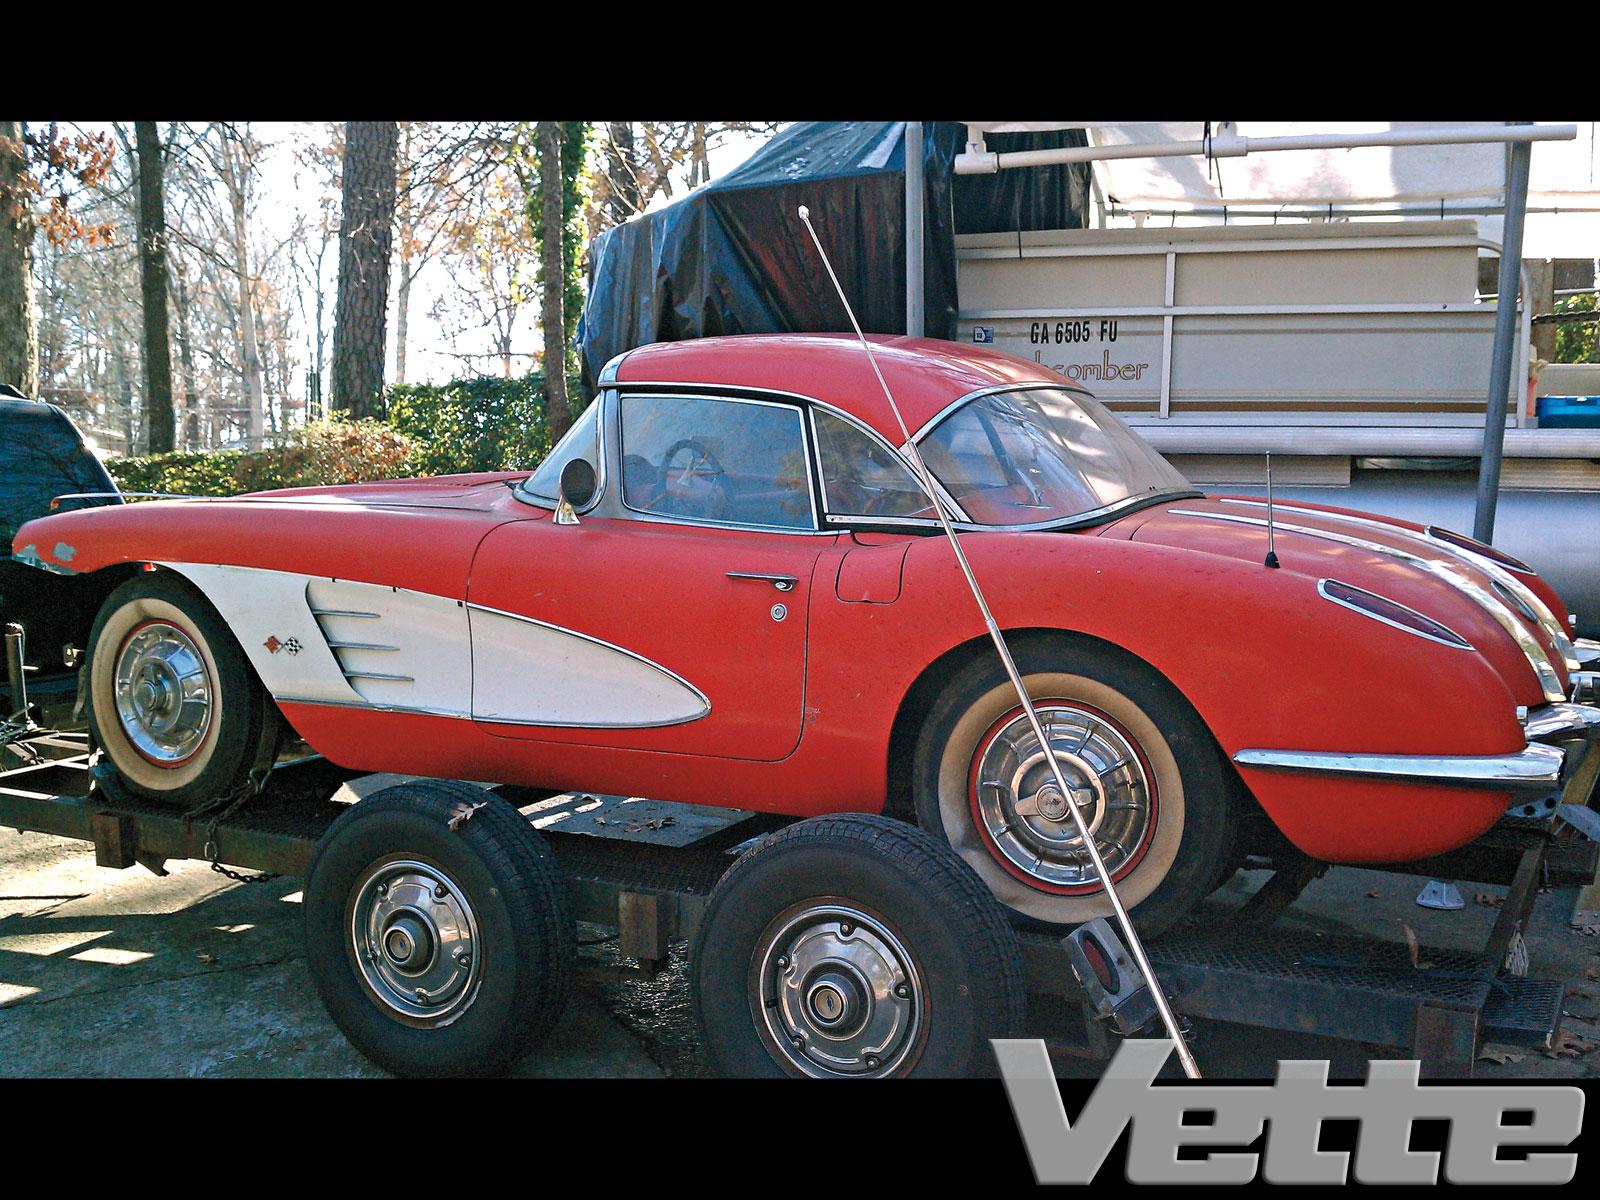 1958 Chevrolet Corvette Too Good To Be True C1 Rare Find Vette